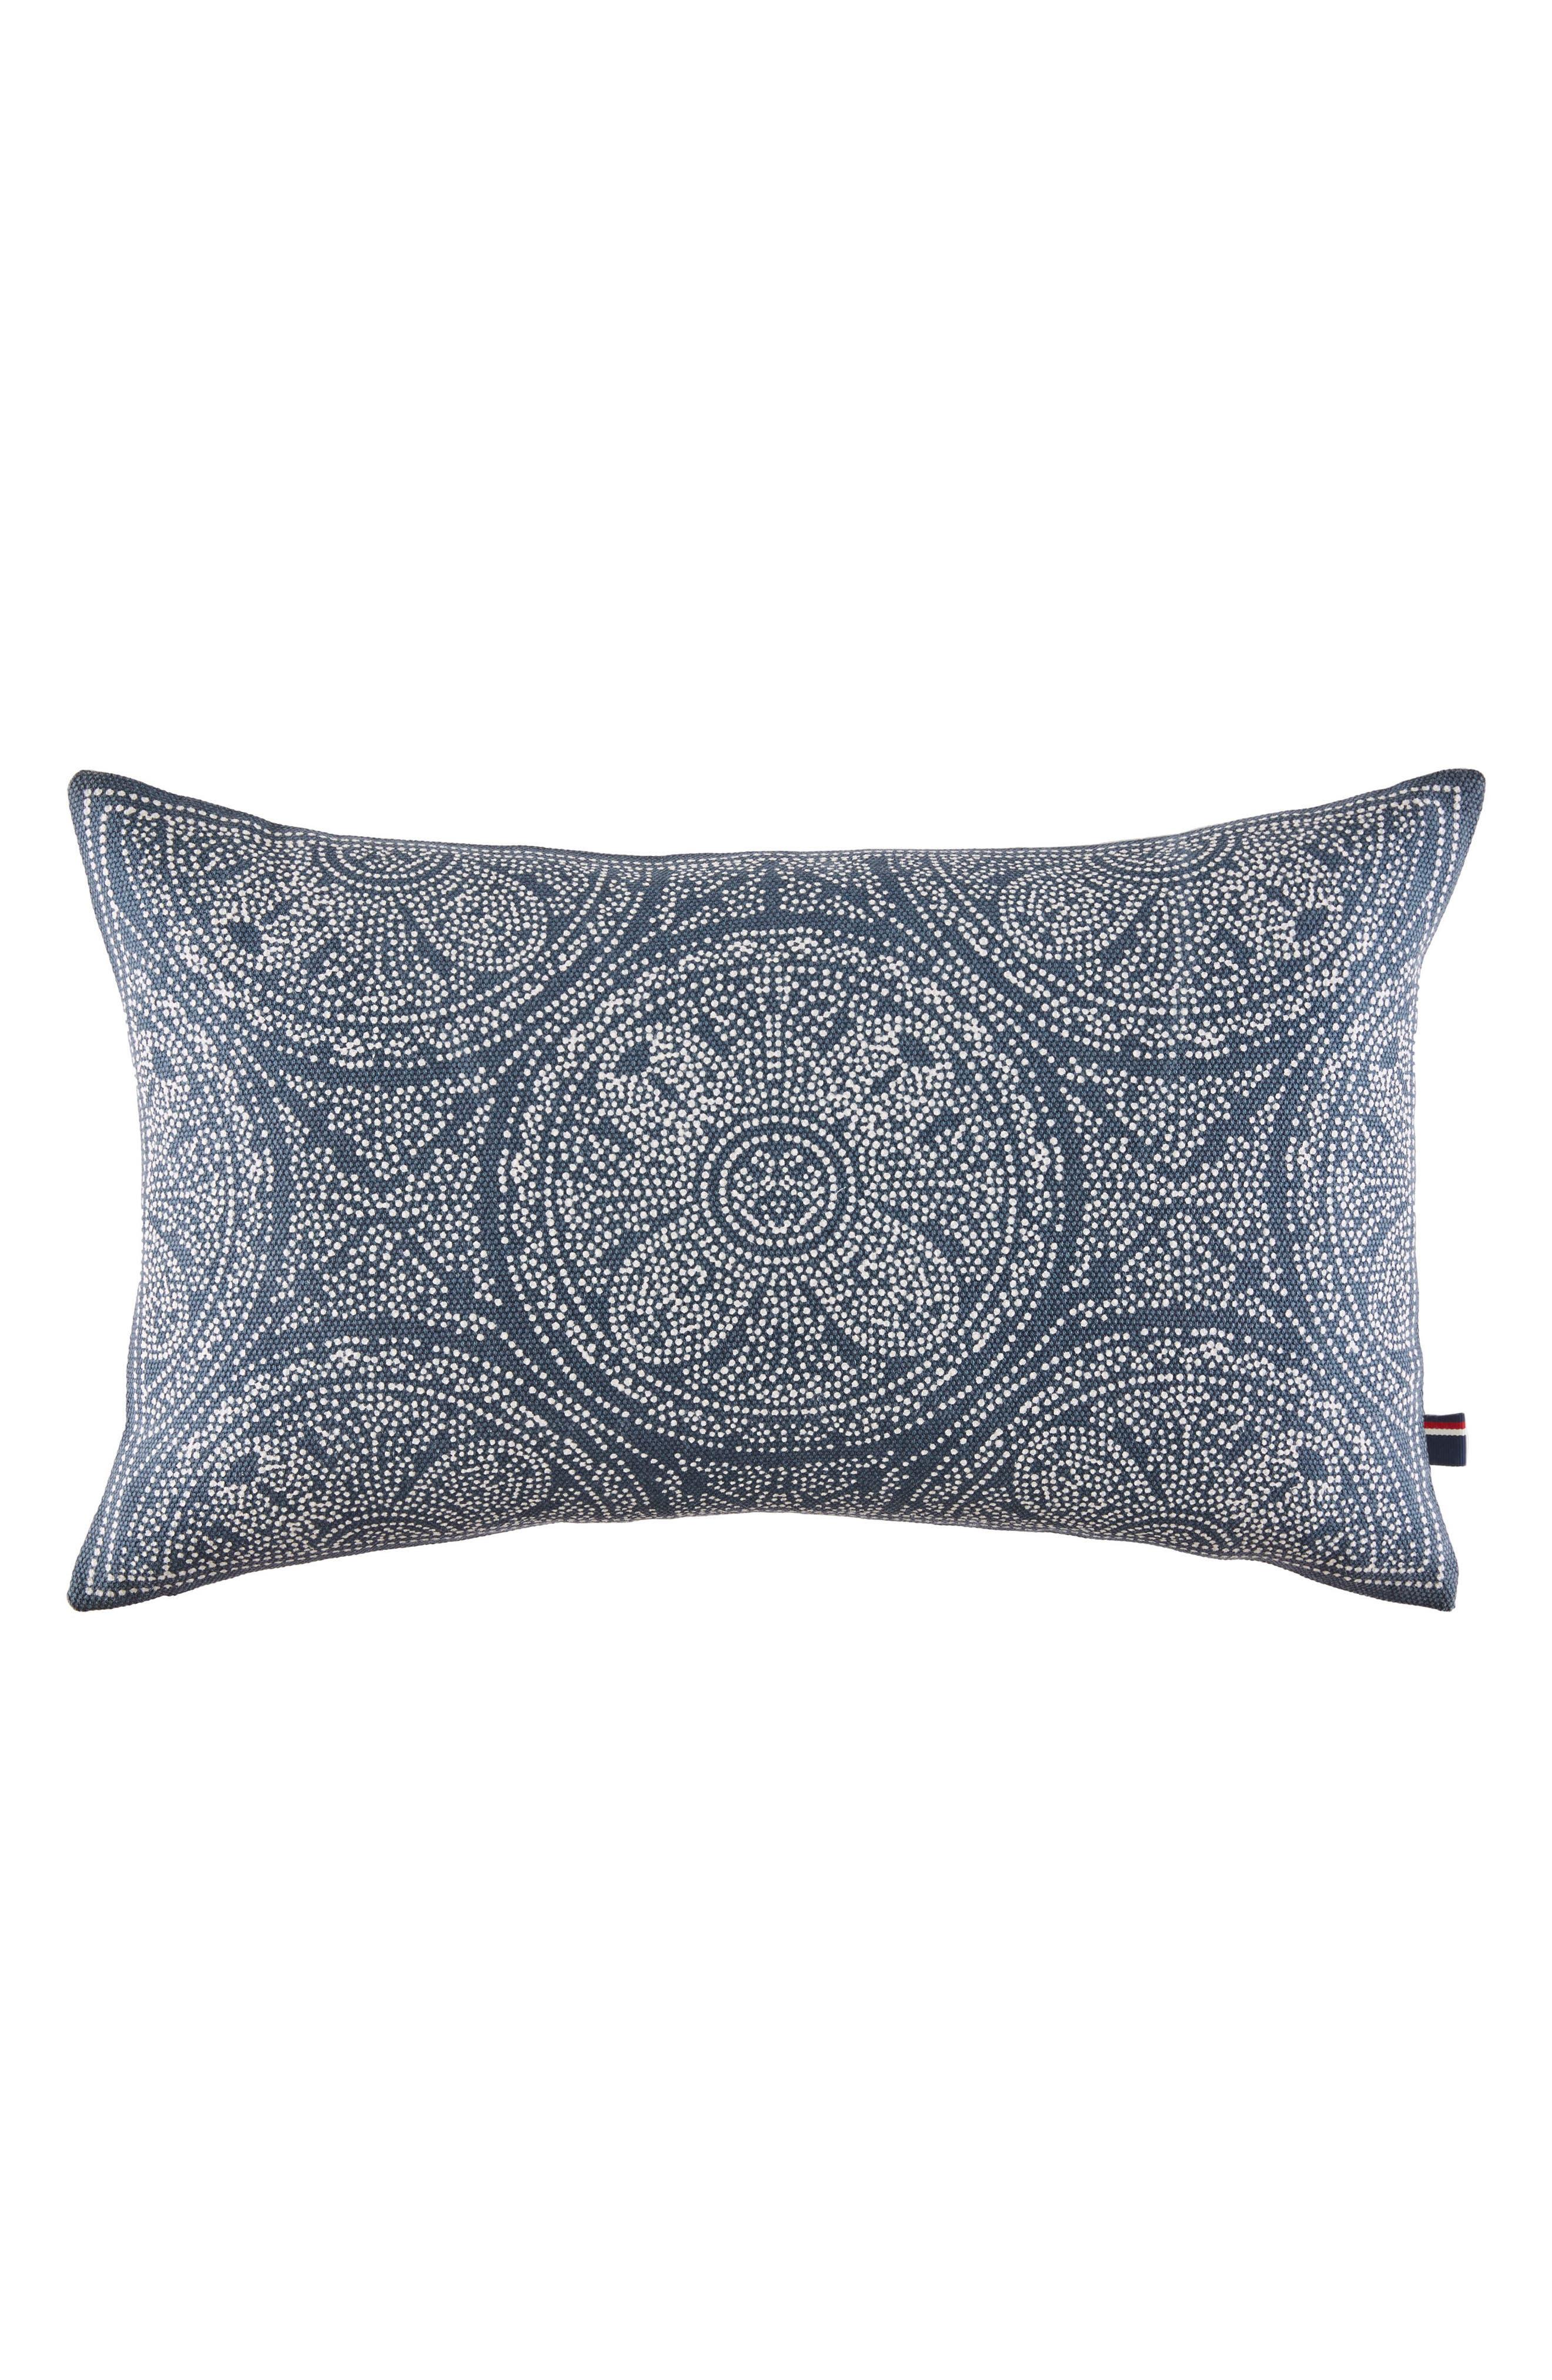 Alternate Image 1 Selected - Tommy Hilfiger Batik Indigo Accent Pillow